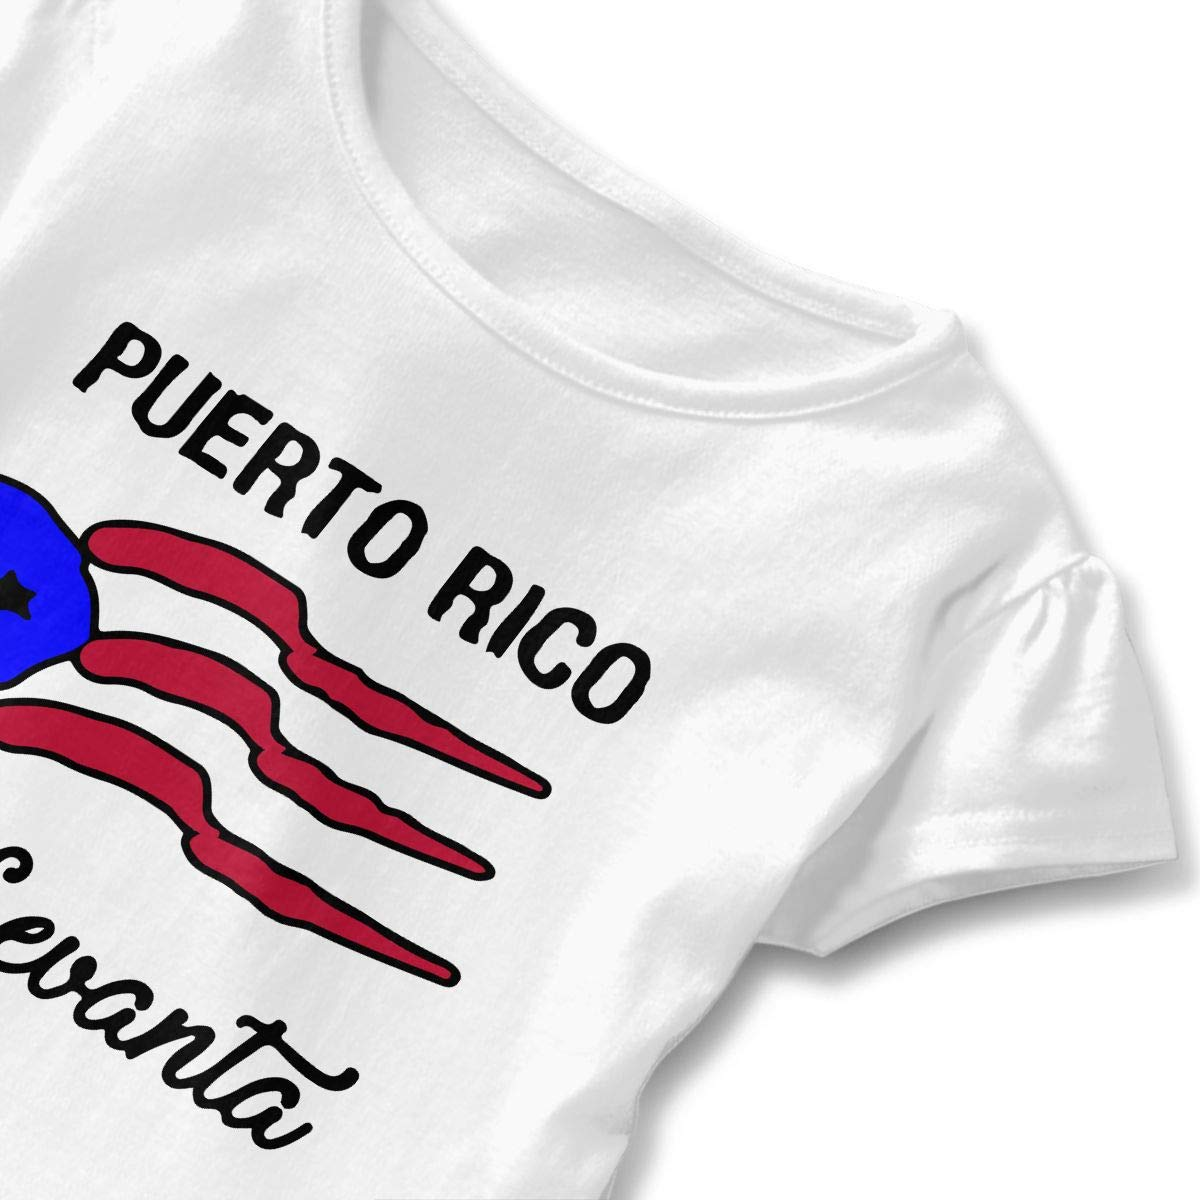 2-6 Years Vfbggg-Shirt Puerto Rican Flag Baby Girls Short Sleeve Ruffle Tee Cotton Kids T Shirts